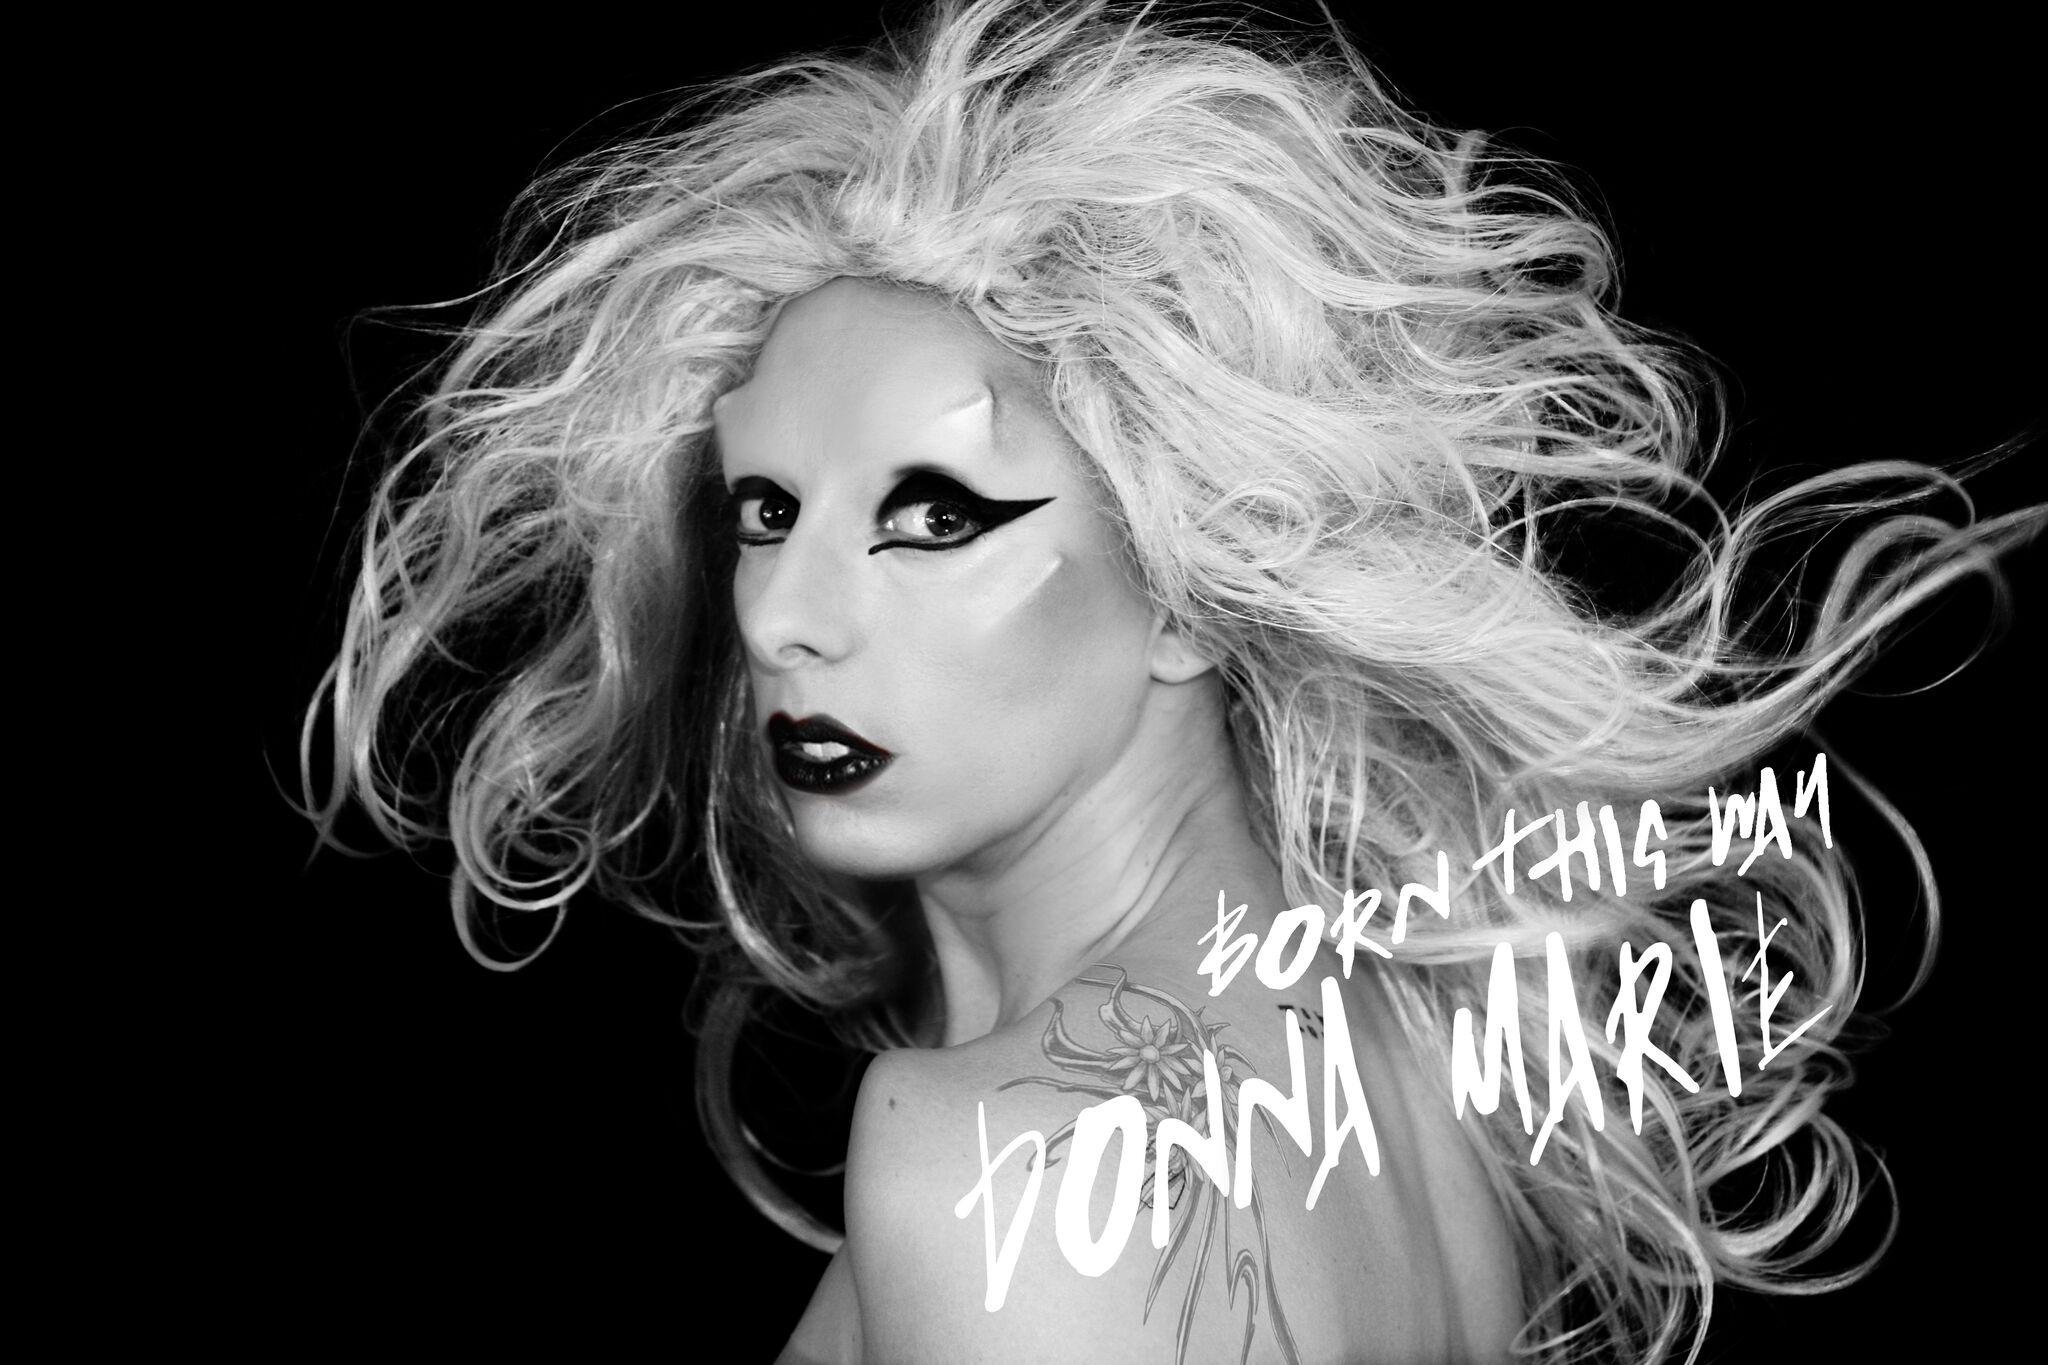 Tribute: Danna Marie as Lady Gaga